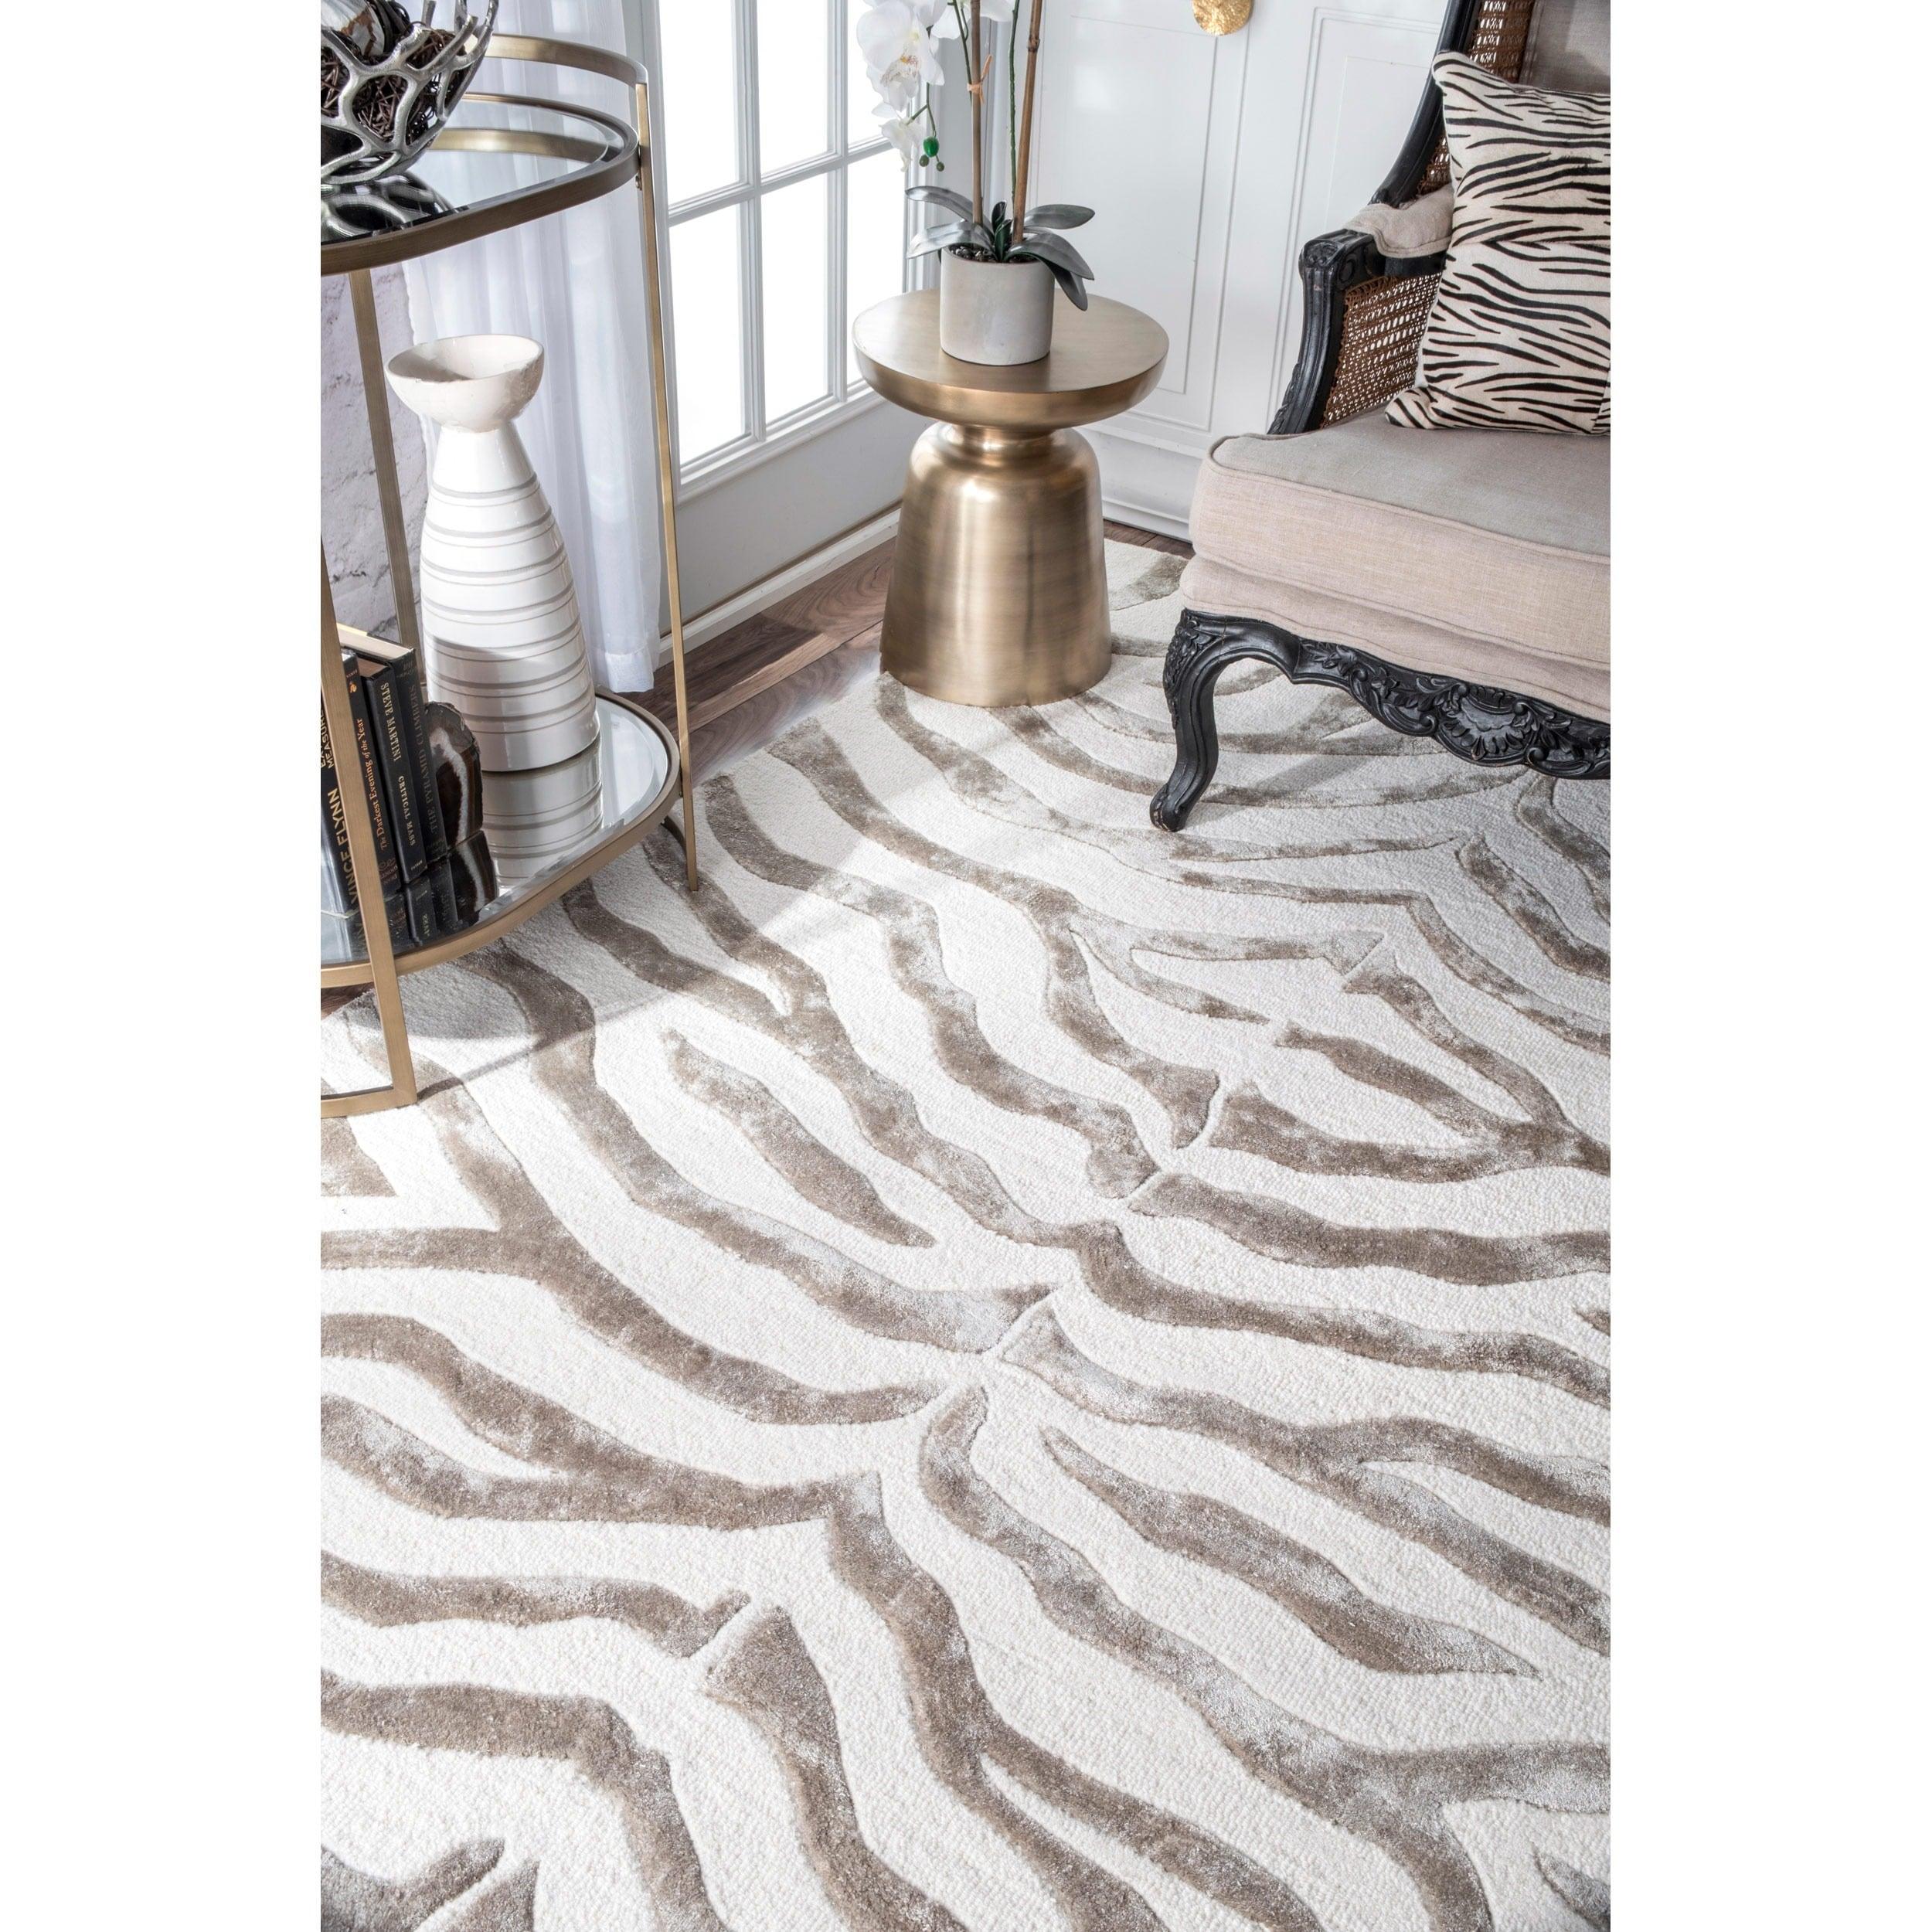 s rugs drapery zebra en us sand ethanallen ivory gray rug shop large clearance